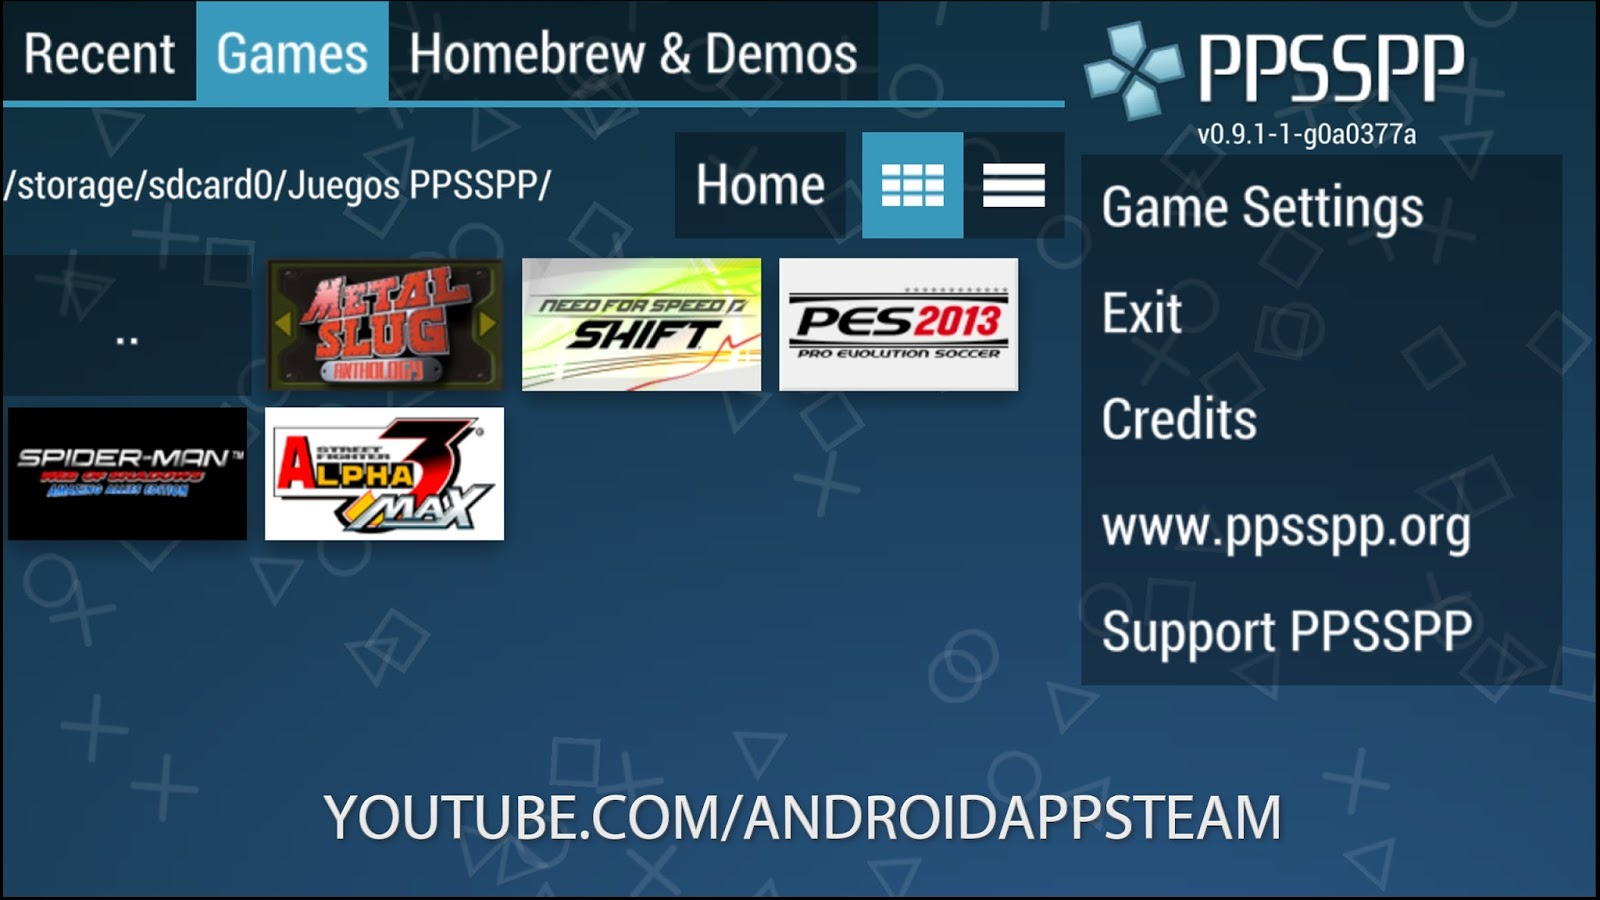 Ppsspp Gold Psp Emulator V1 7 5 Paid Apk El Mejor Emulador De